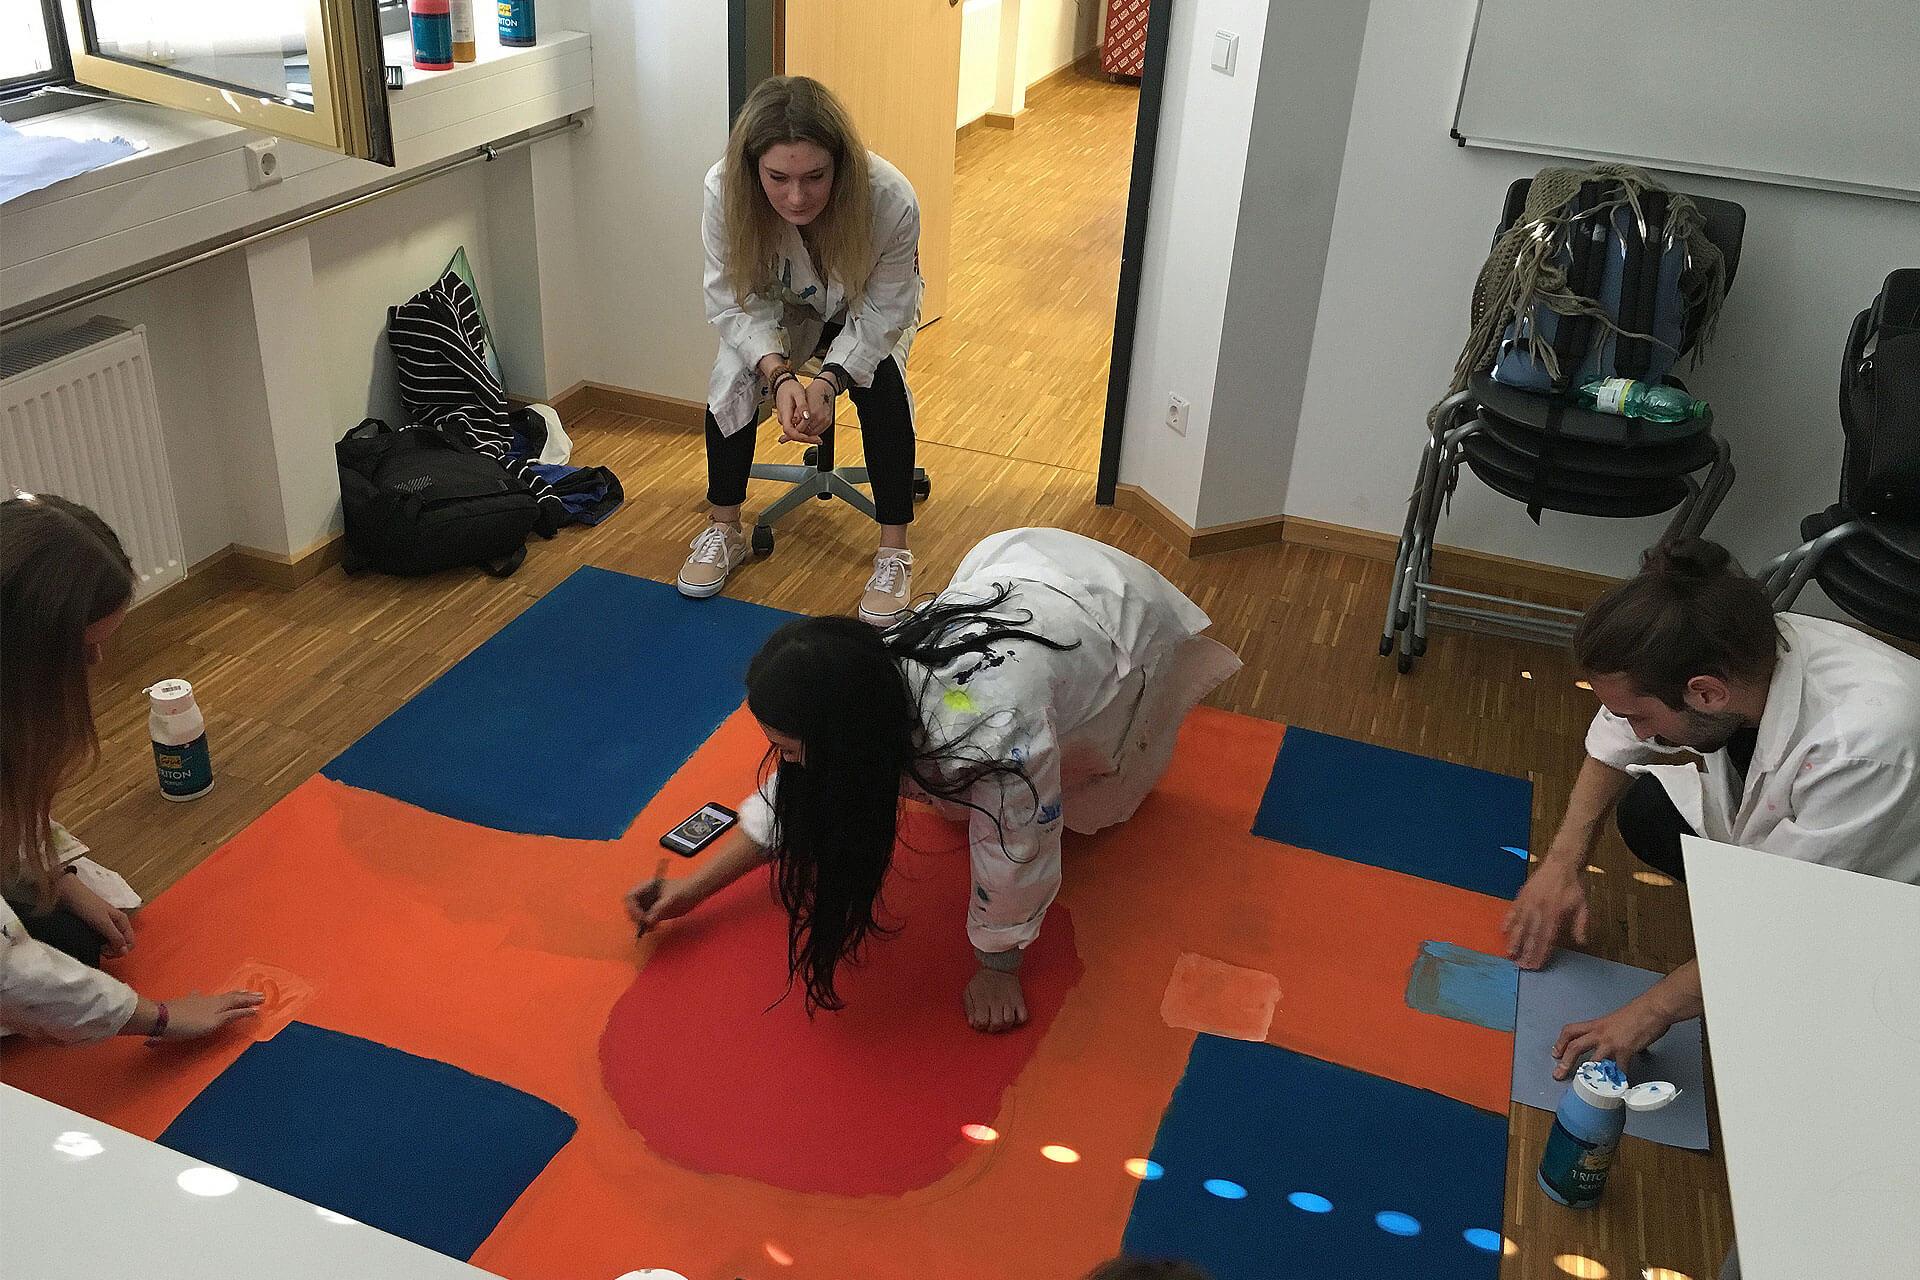 2018 10 16 Kunstgenuss 2018 2 Content Bild 2